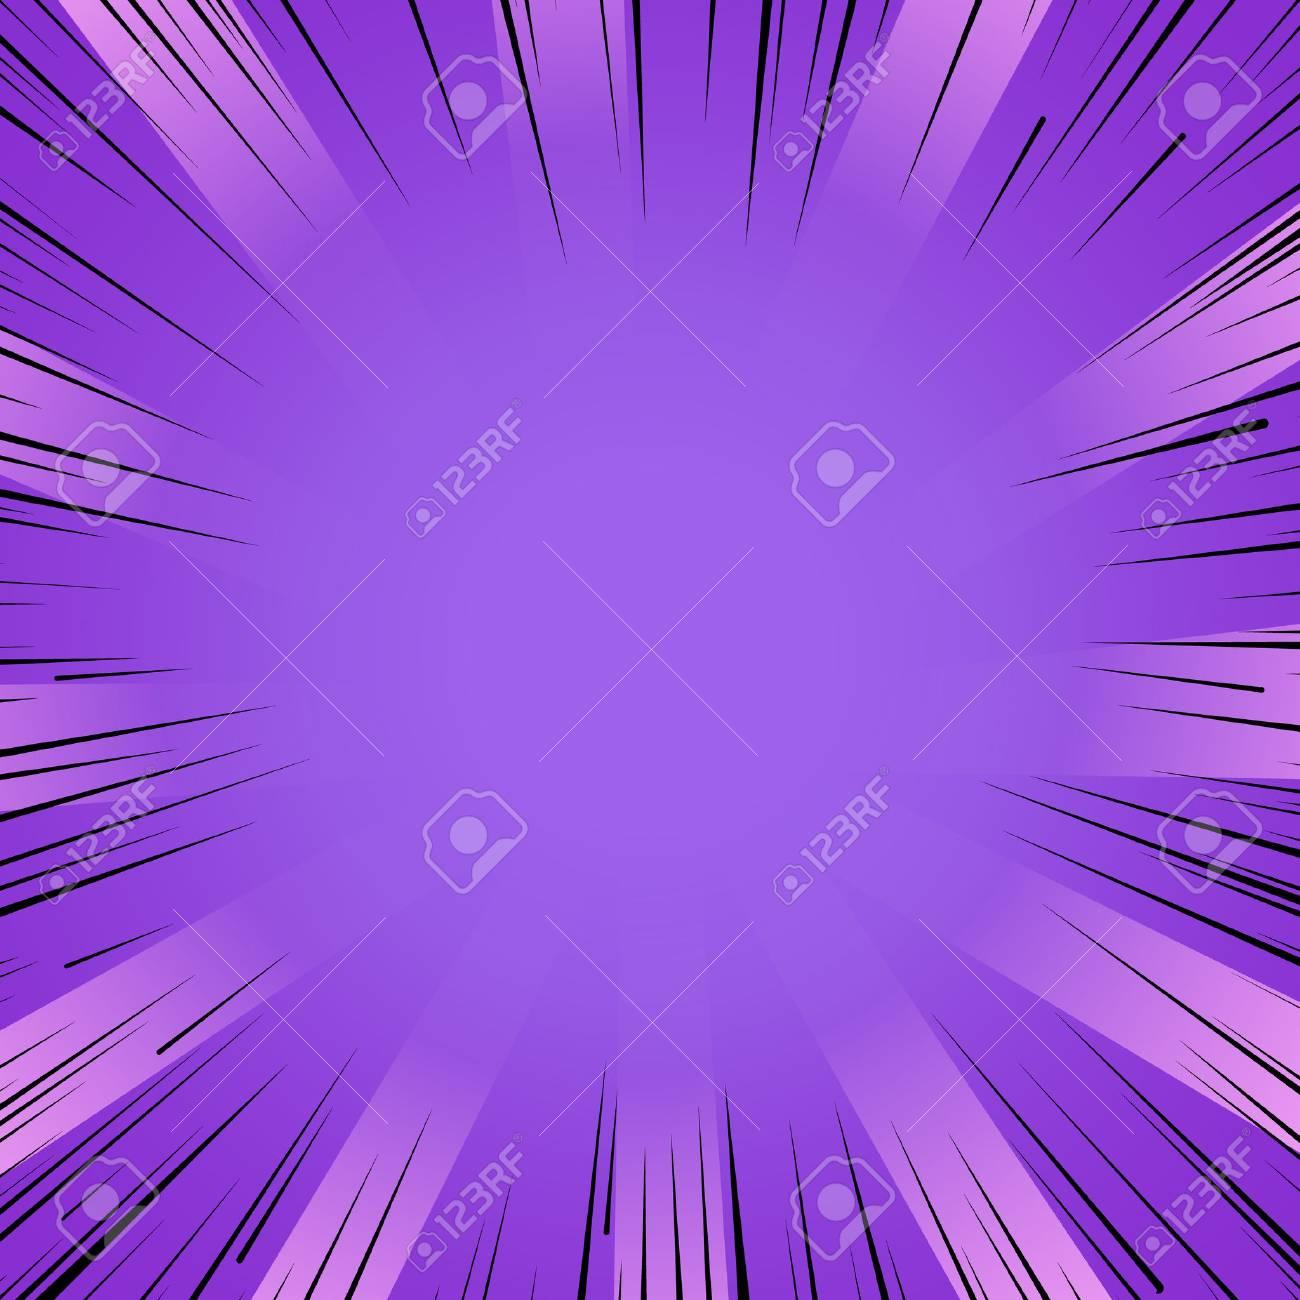 Abstract comic book flash bright purple explosion radial lines background. Vector illustration for superhero design. Light strip burst. Flash ray blast glow Manga cartoon hero fight cute print - 67874754